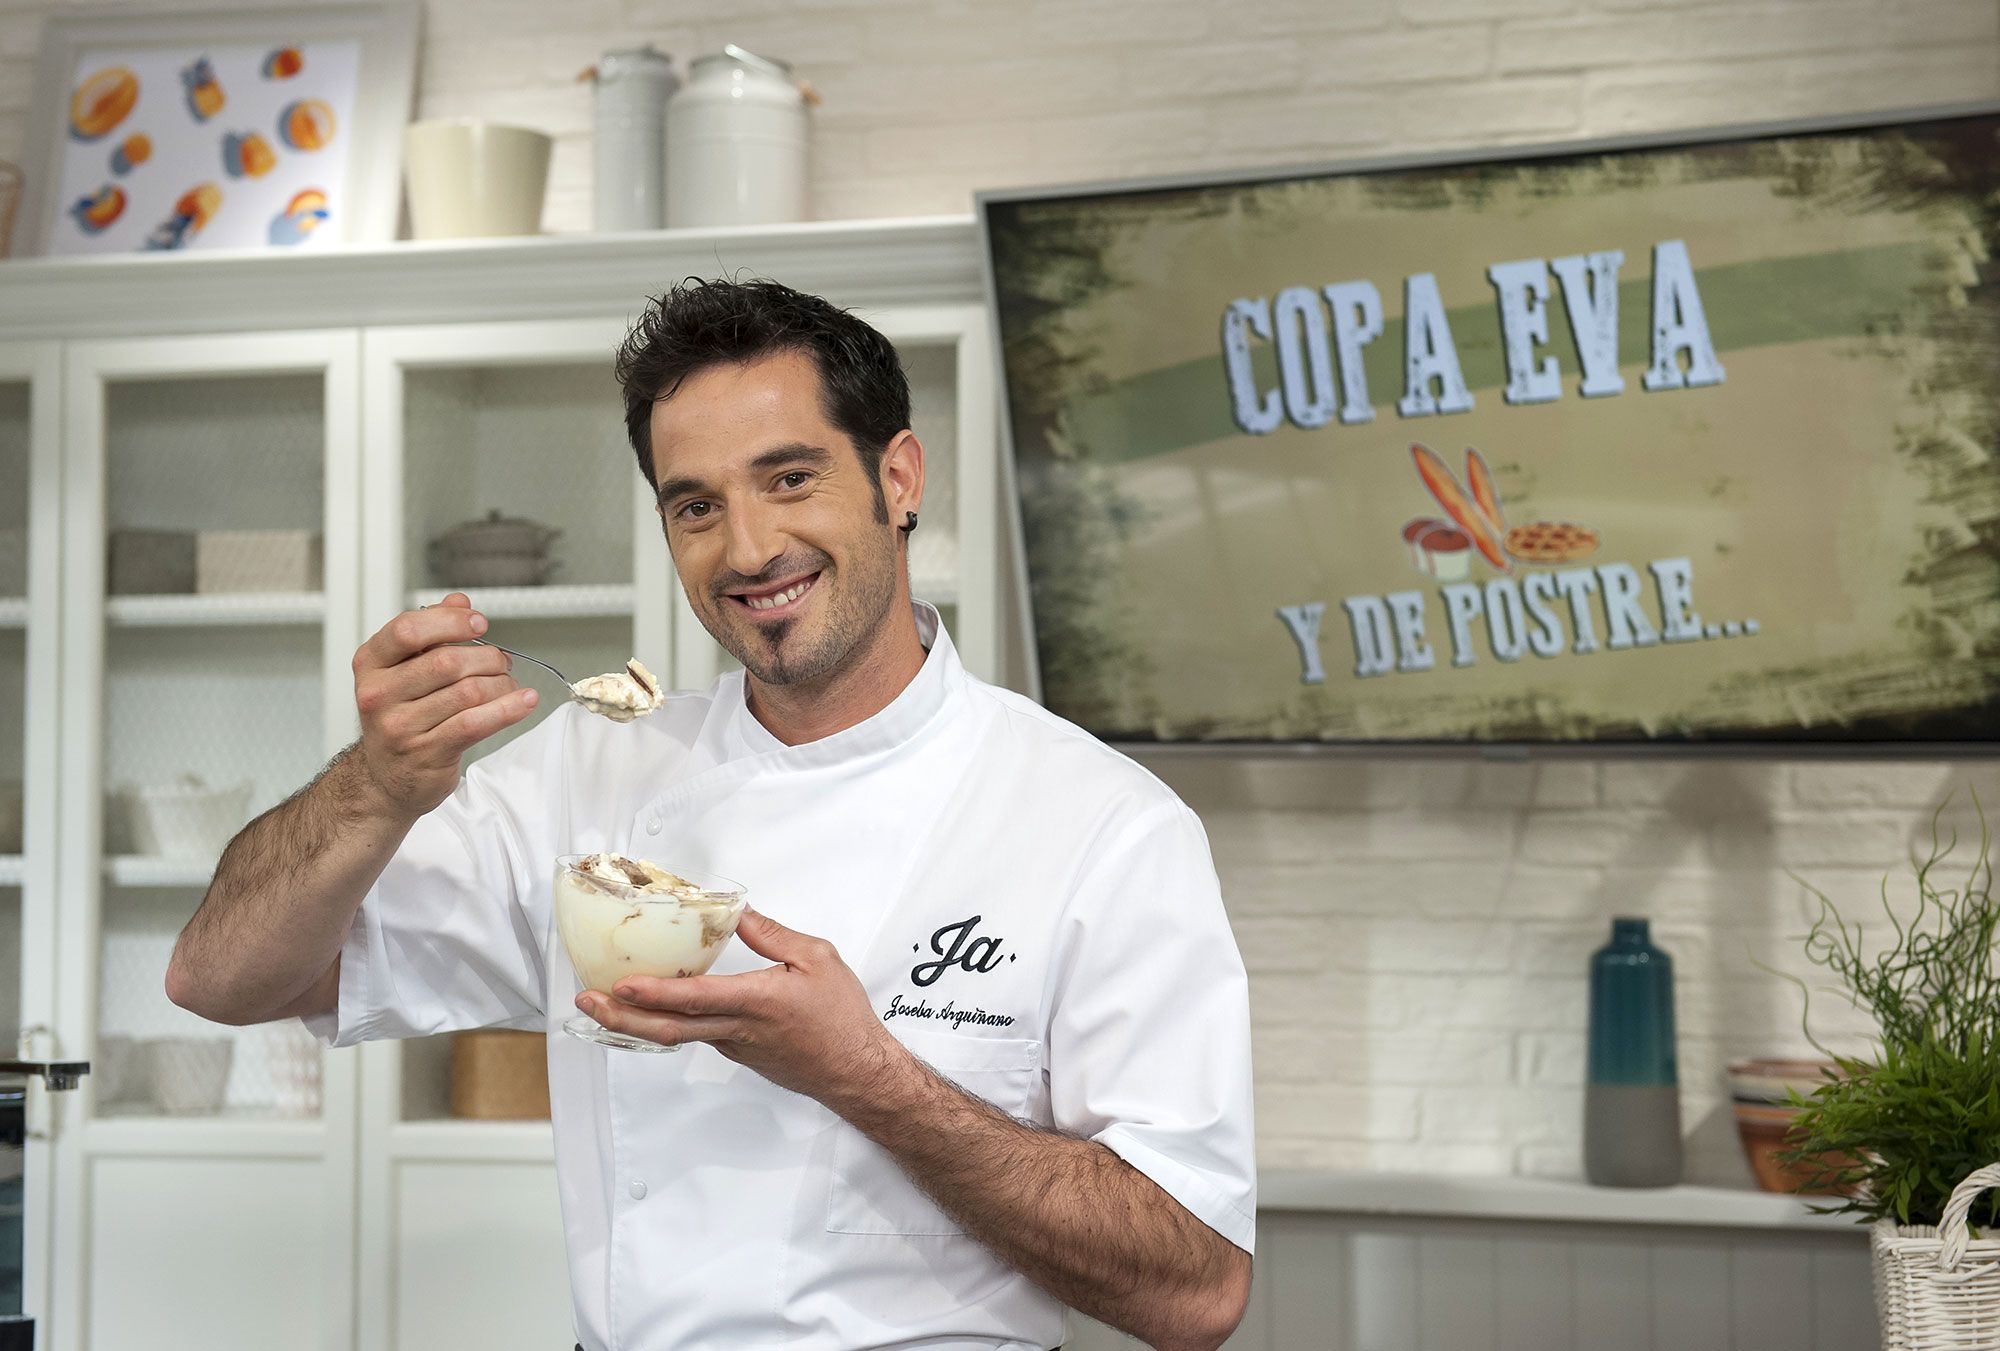 Copa Eva